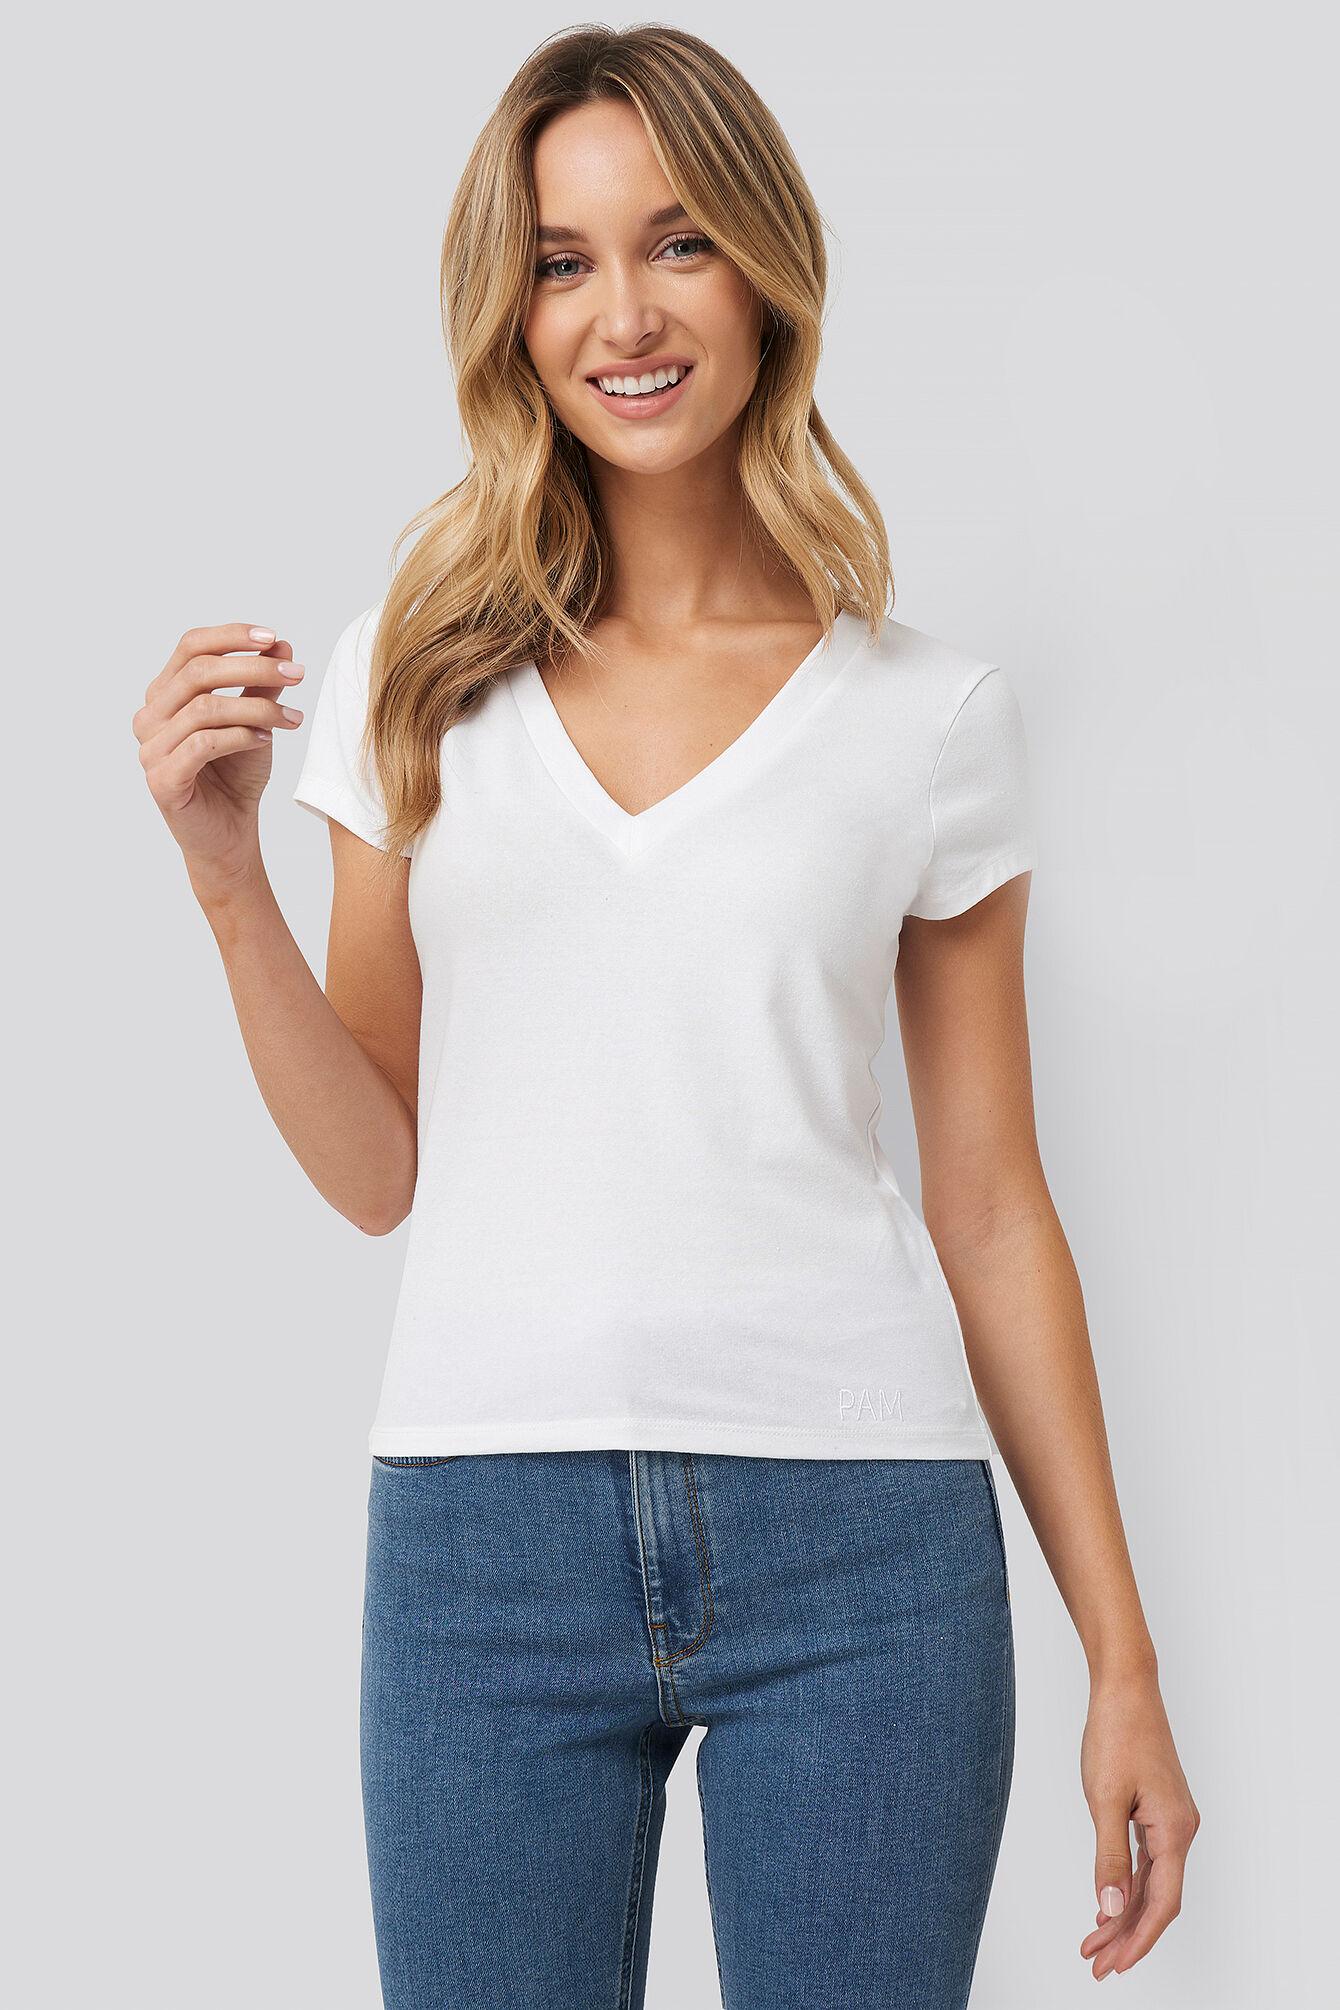 Pamela x NA-KD Deep V-Neck T-shirt - White  - Size: Small